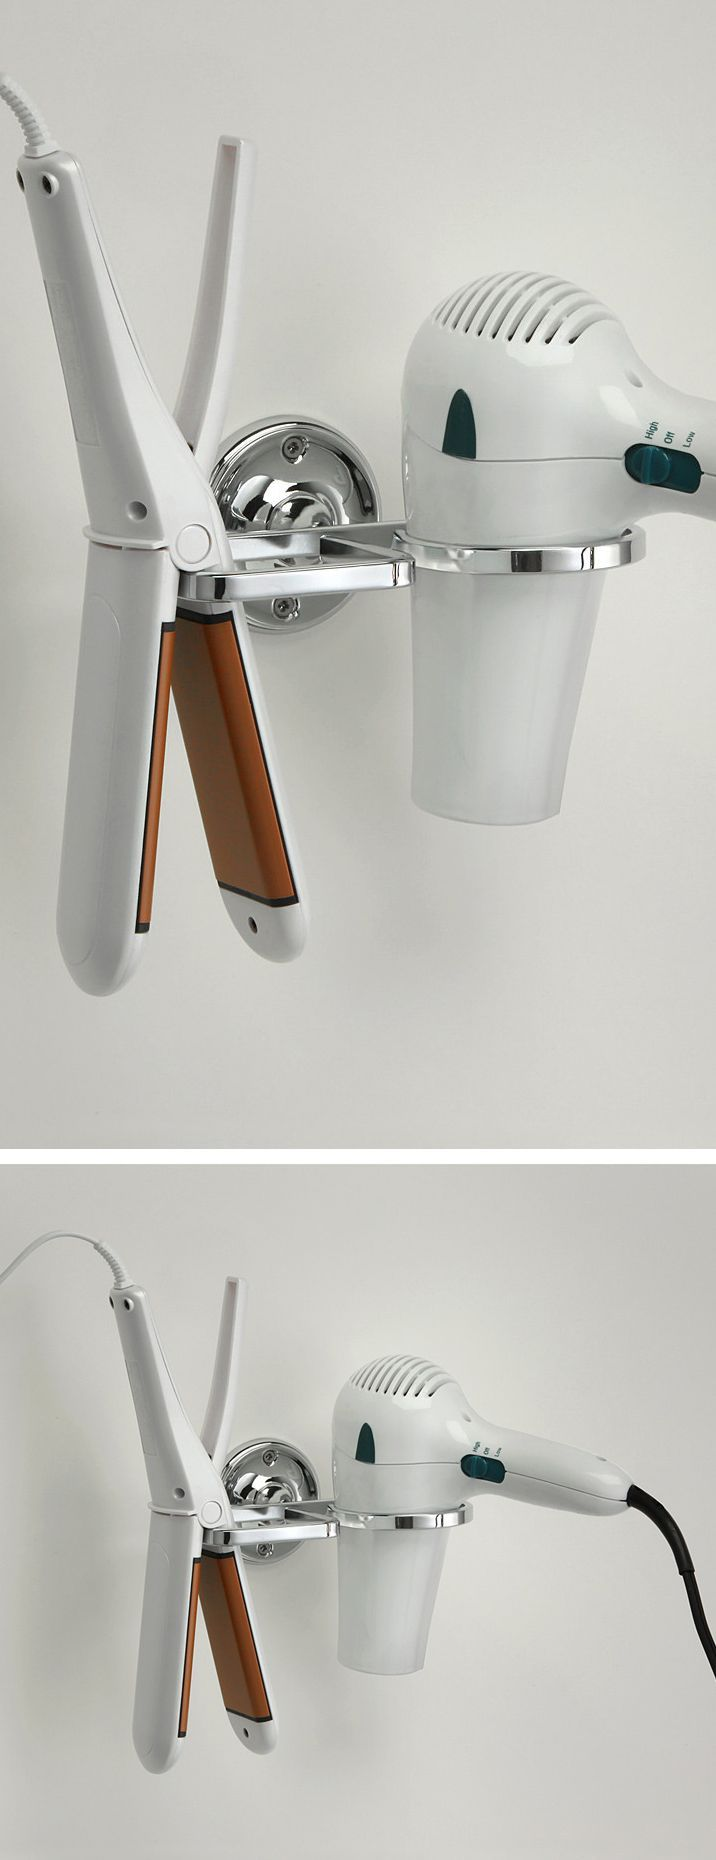 Combination Flat Iron & Blow Dryer Holder #product_design